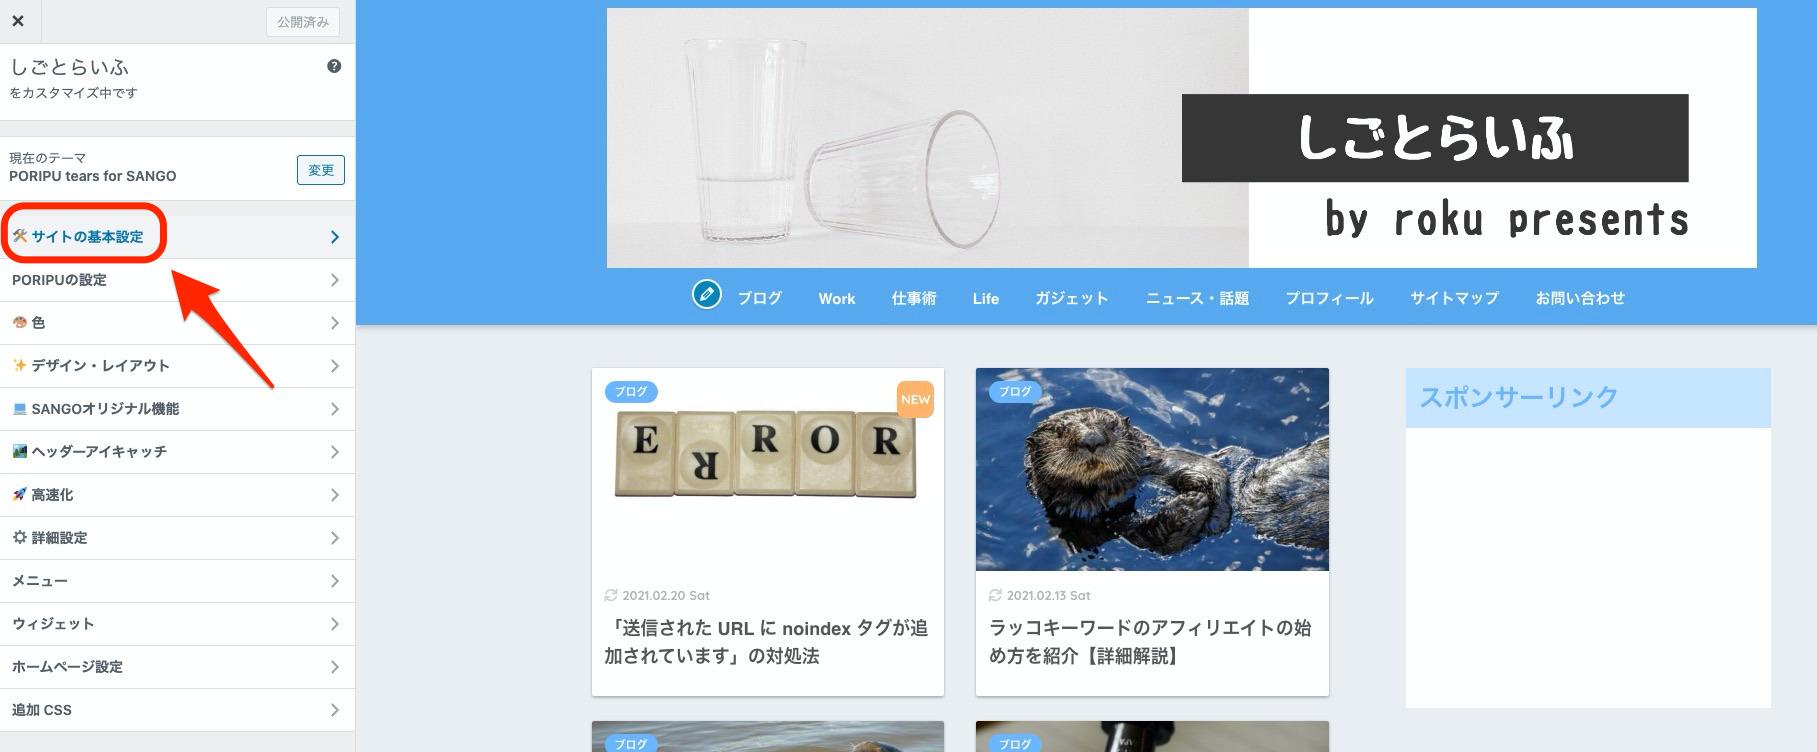 SANGO サイトの基本設定